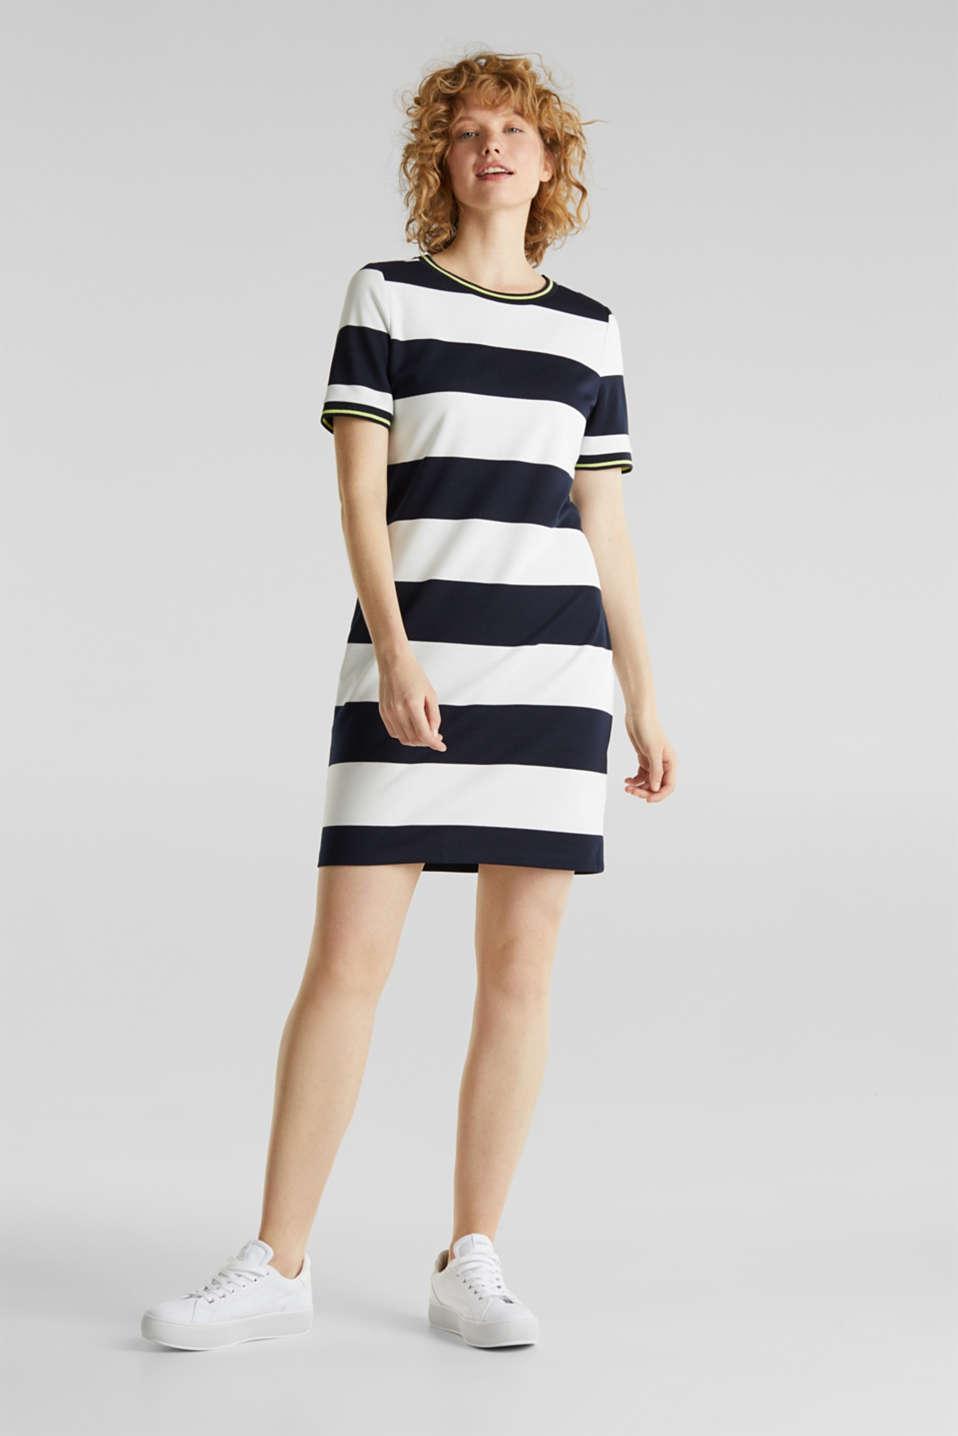 NEON piqué dress with luminous stripes, NAVY, detail image number 1